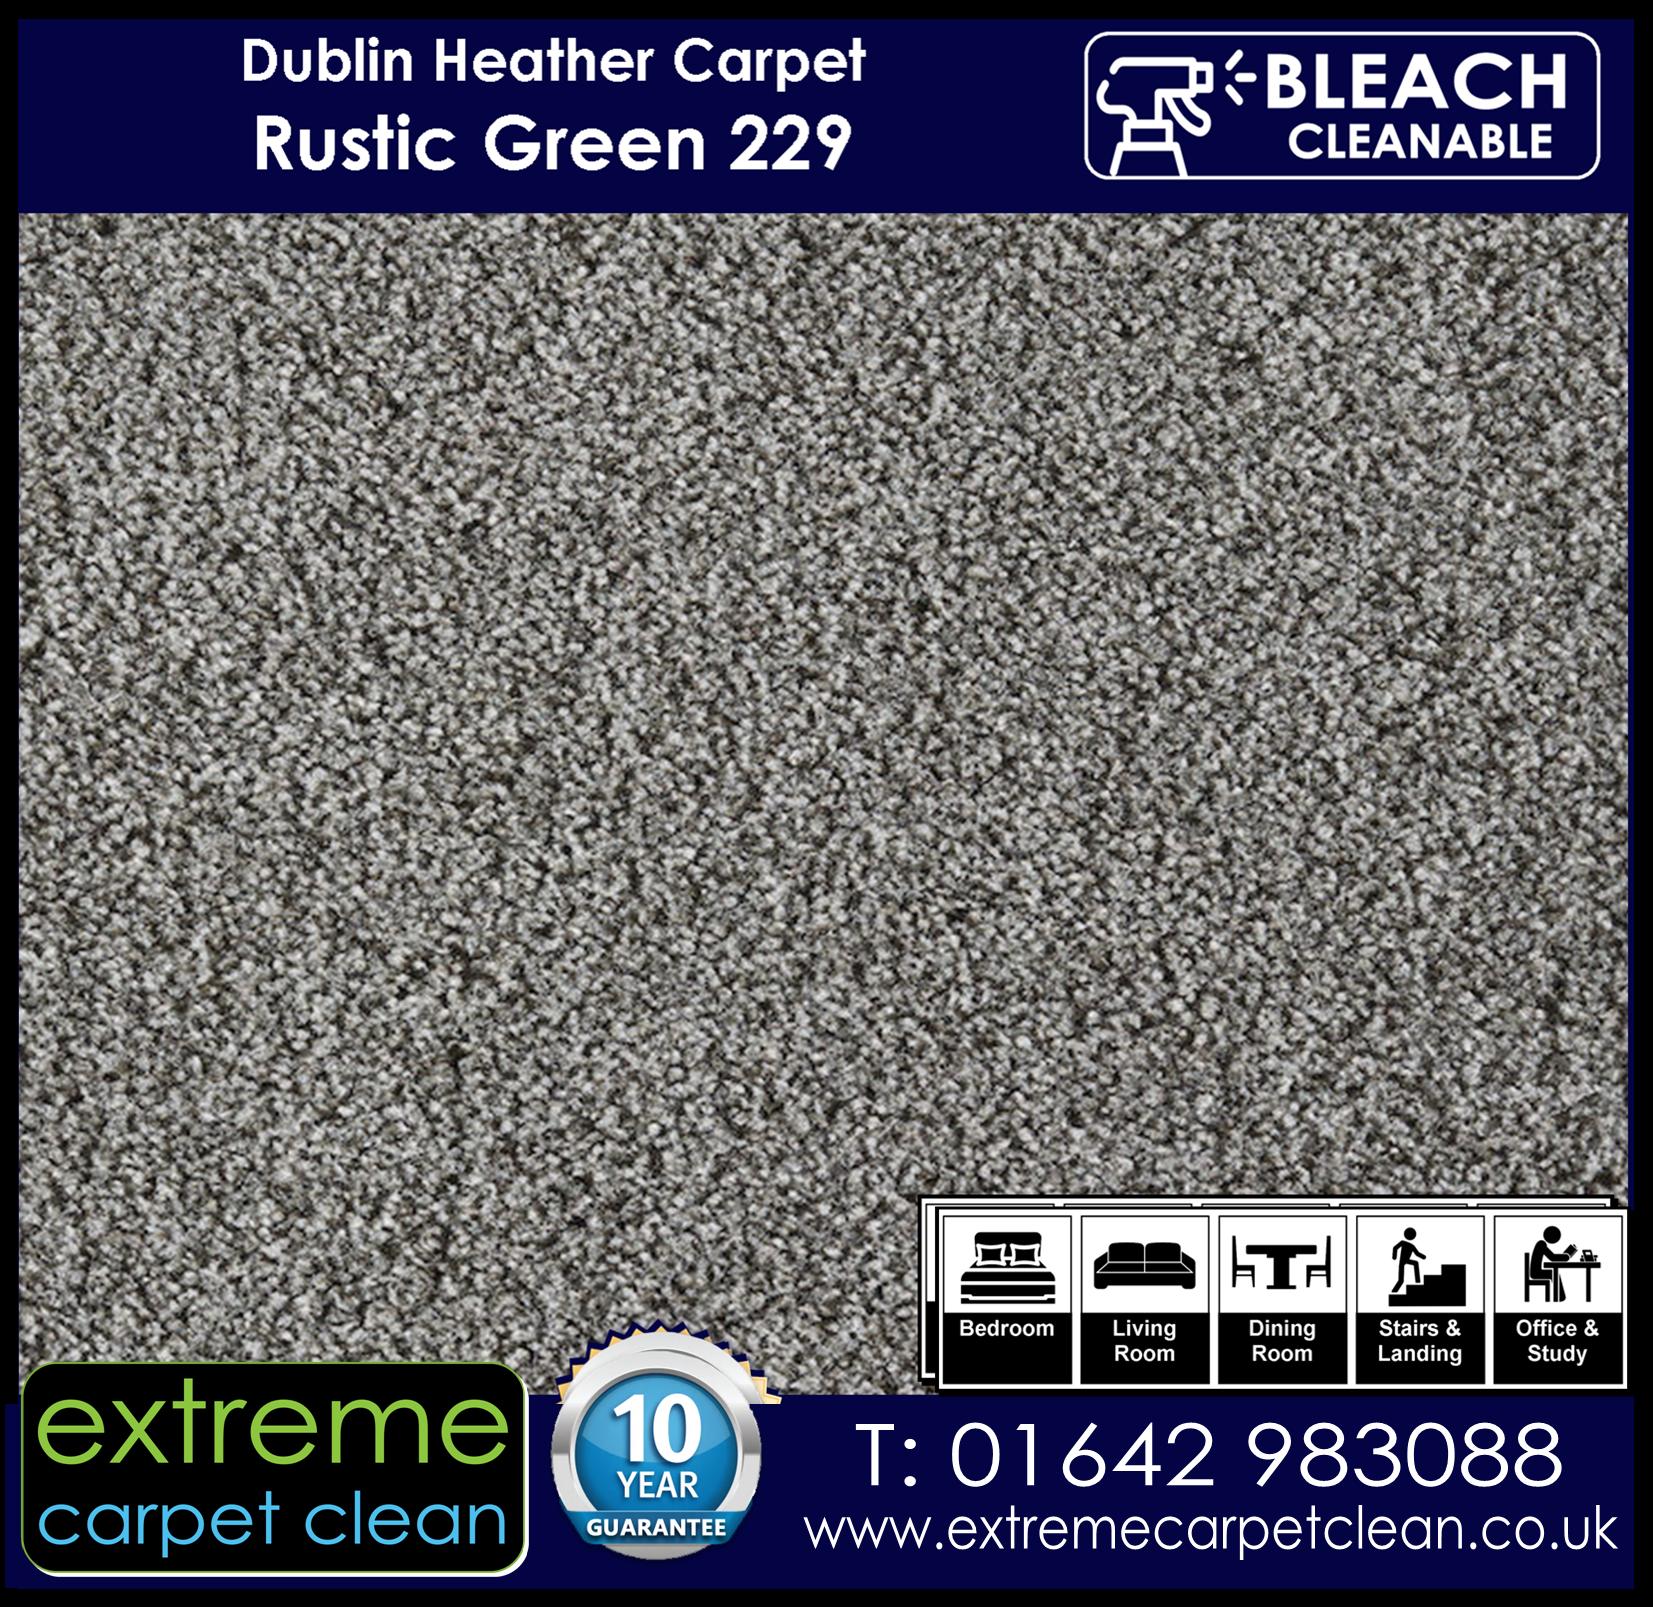 Dublin Heather Carpet Range.  Rustic Green 229 Extreme Carpet Clean